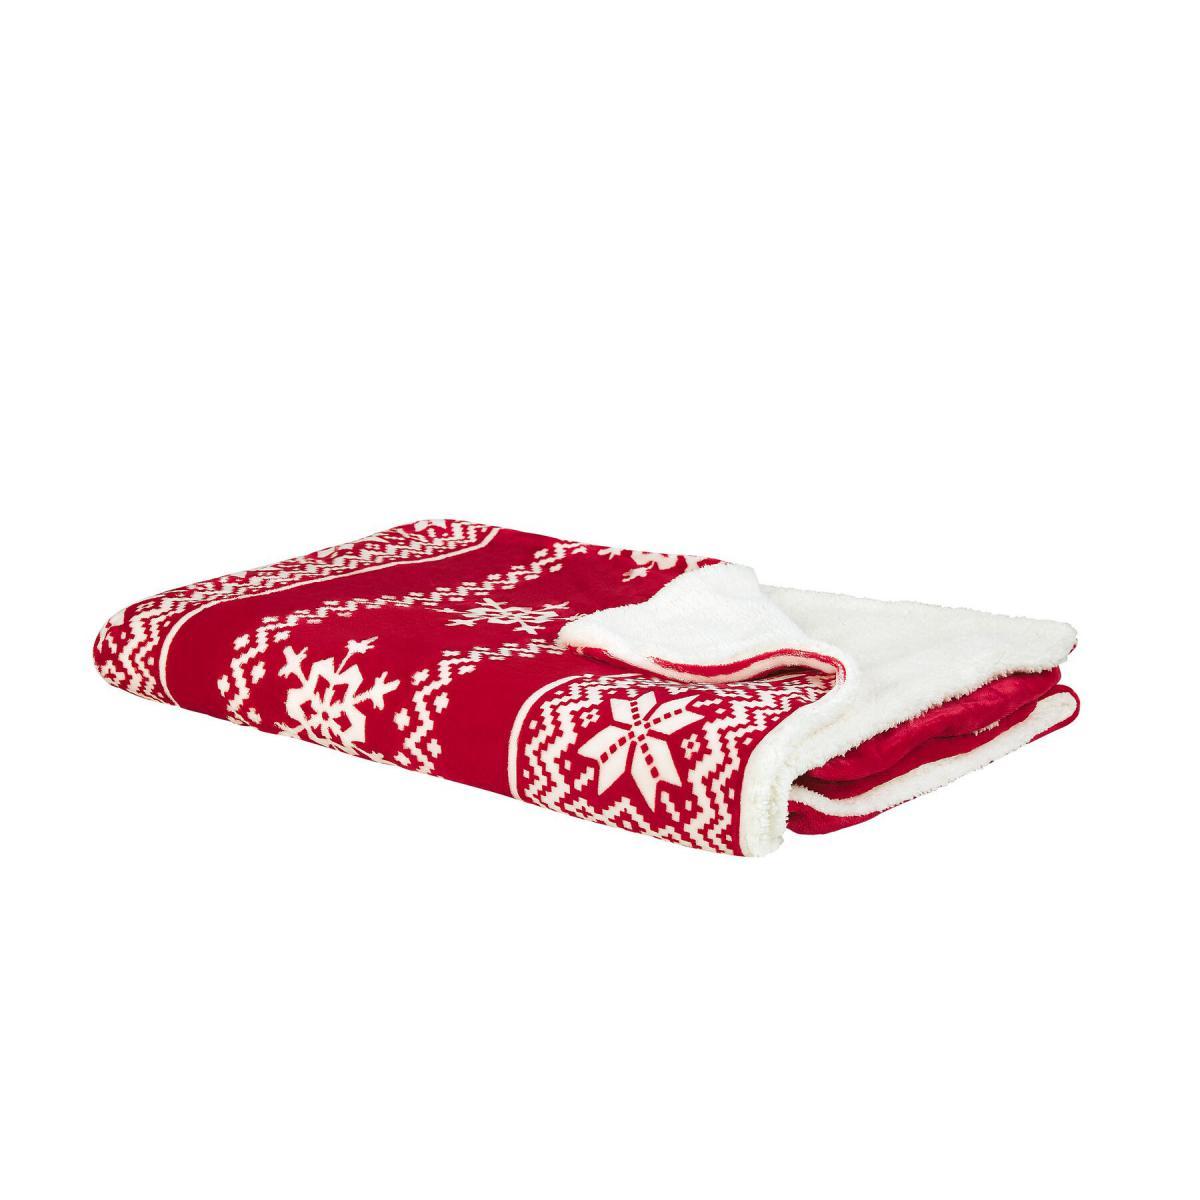 Beliani Beliani Plaid réversible rouge et blanc 200 x 220 cm motif Noël VANTAA - beige